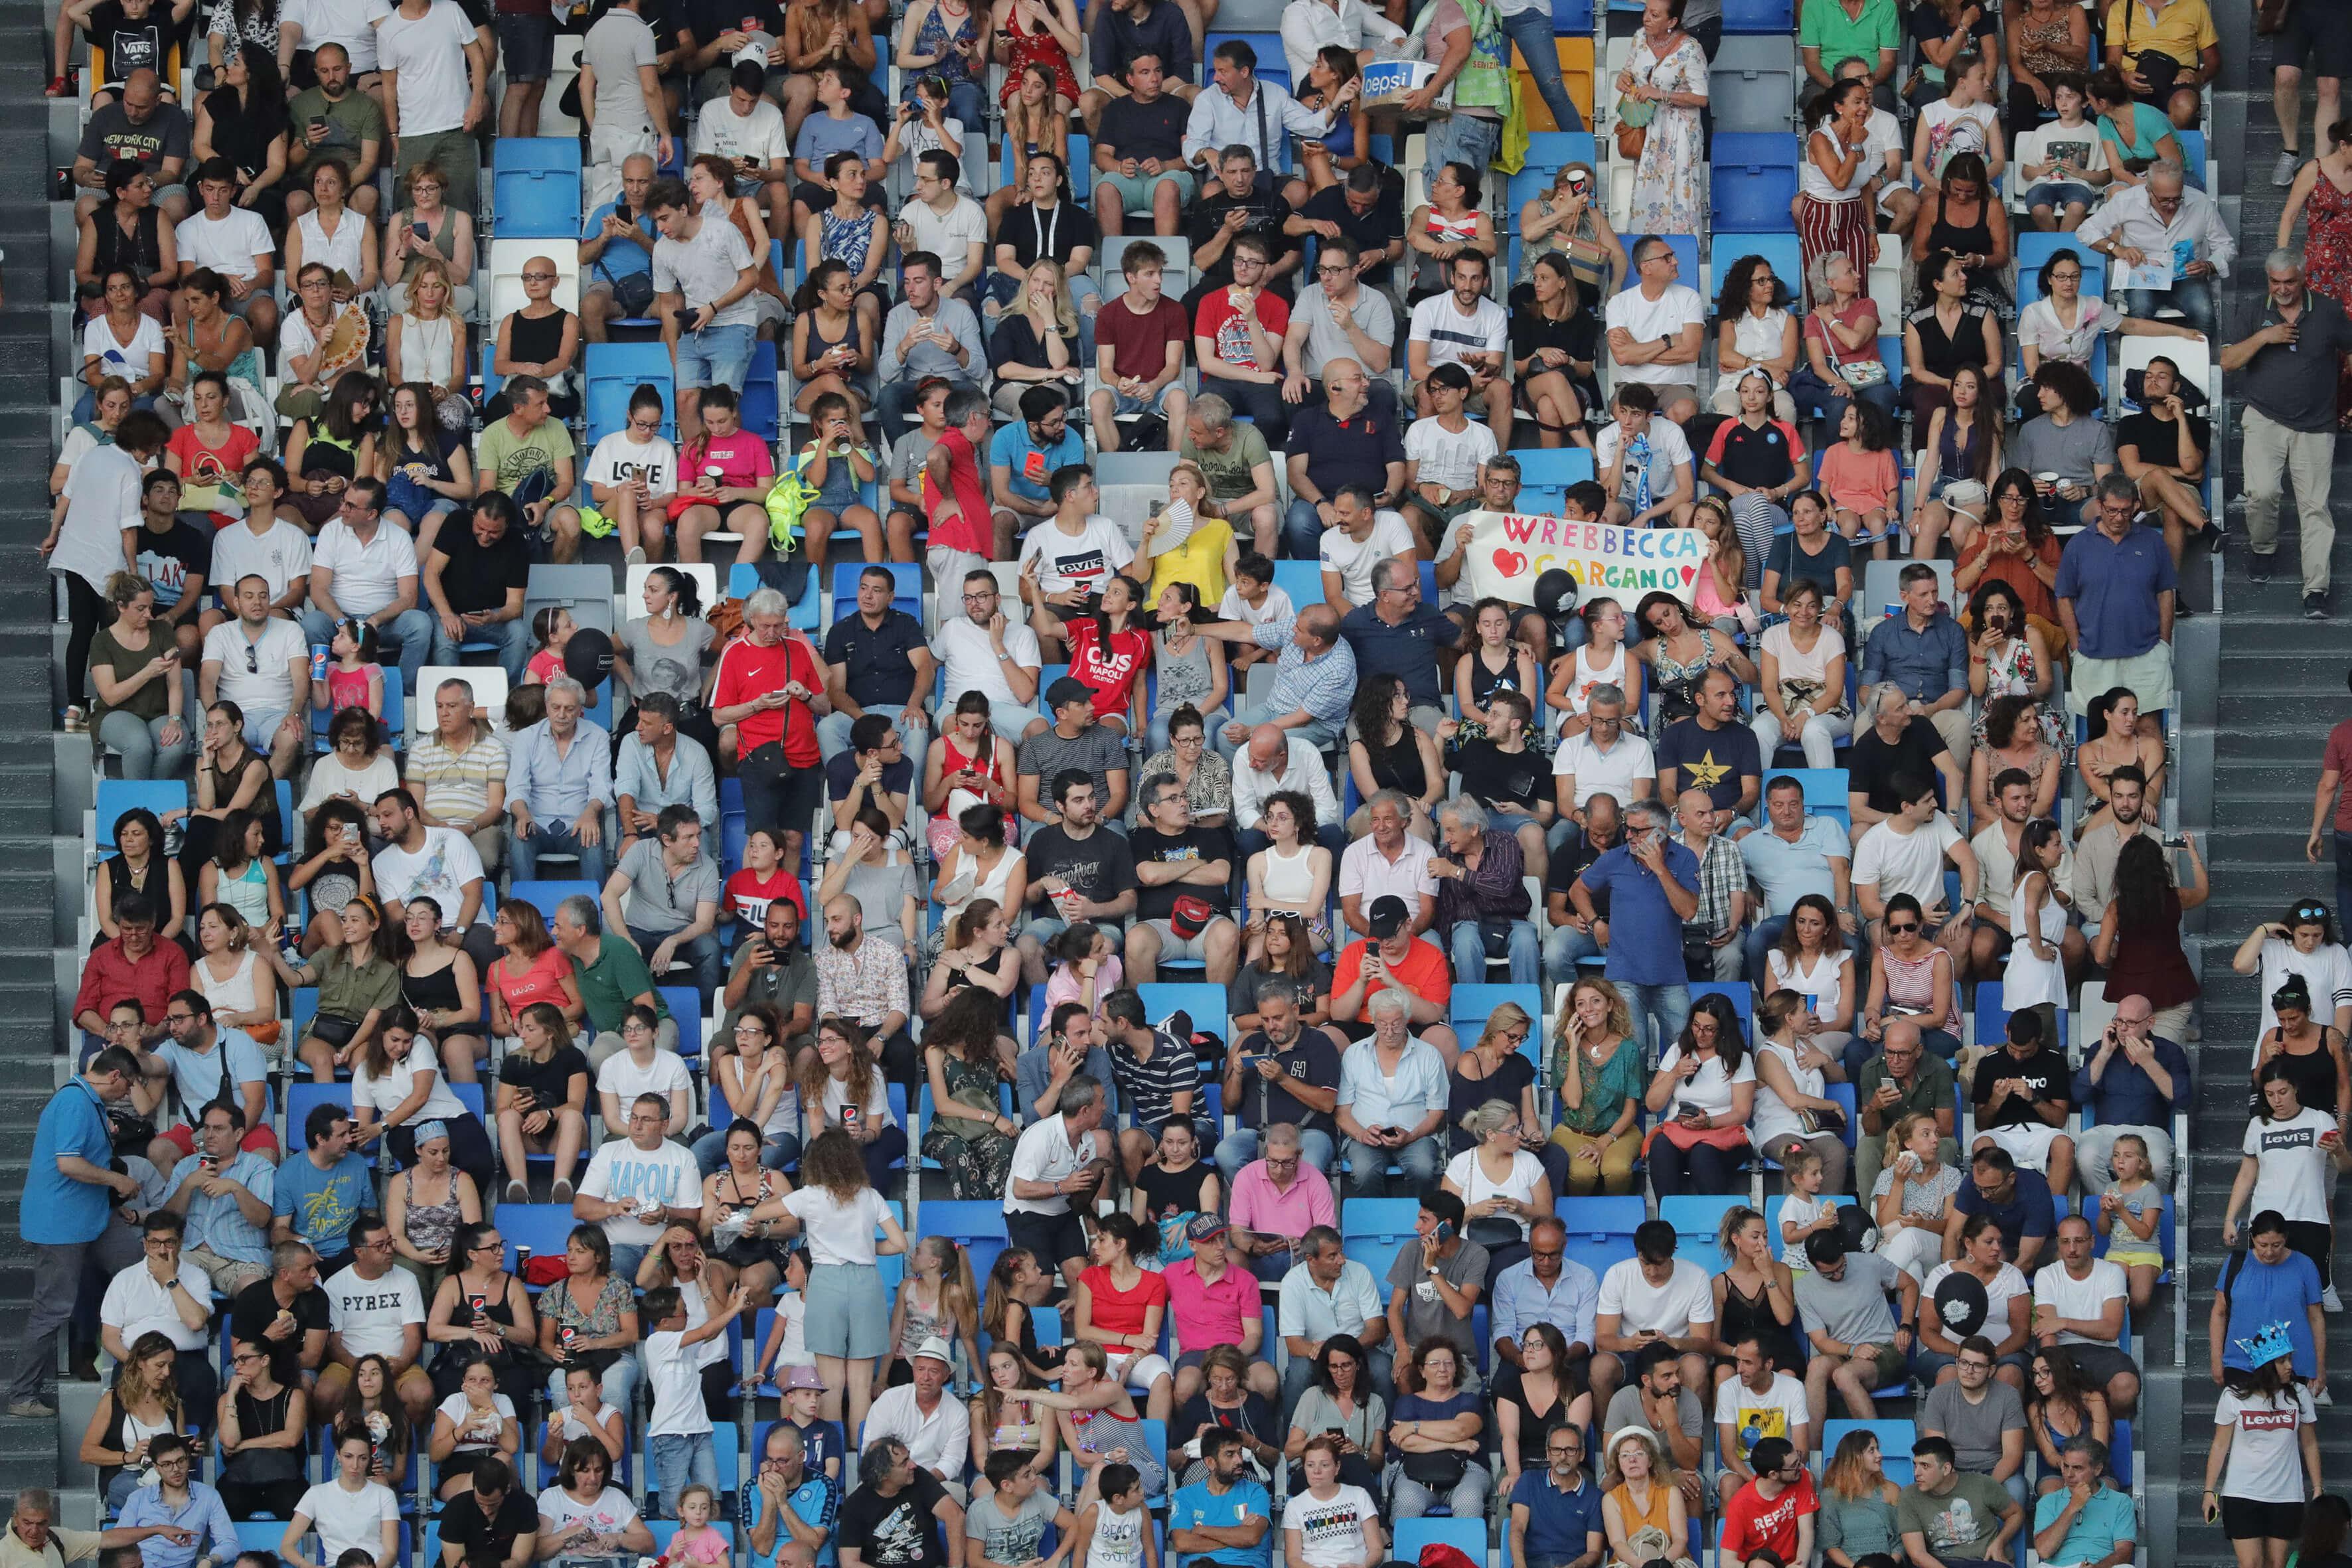 Cerimonia d'Apertura Napoli 2019